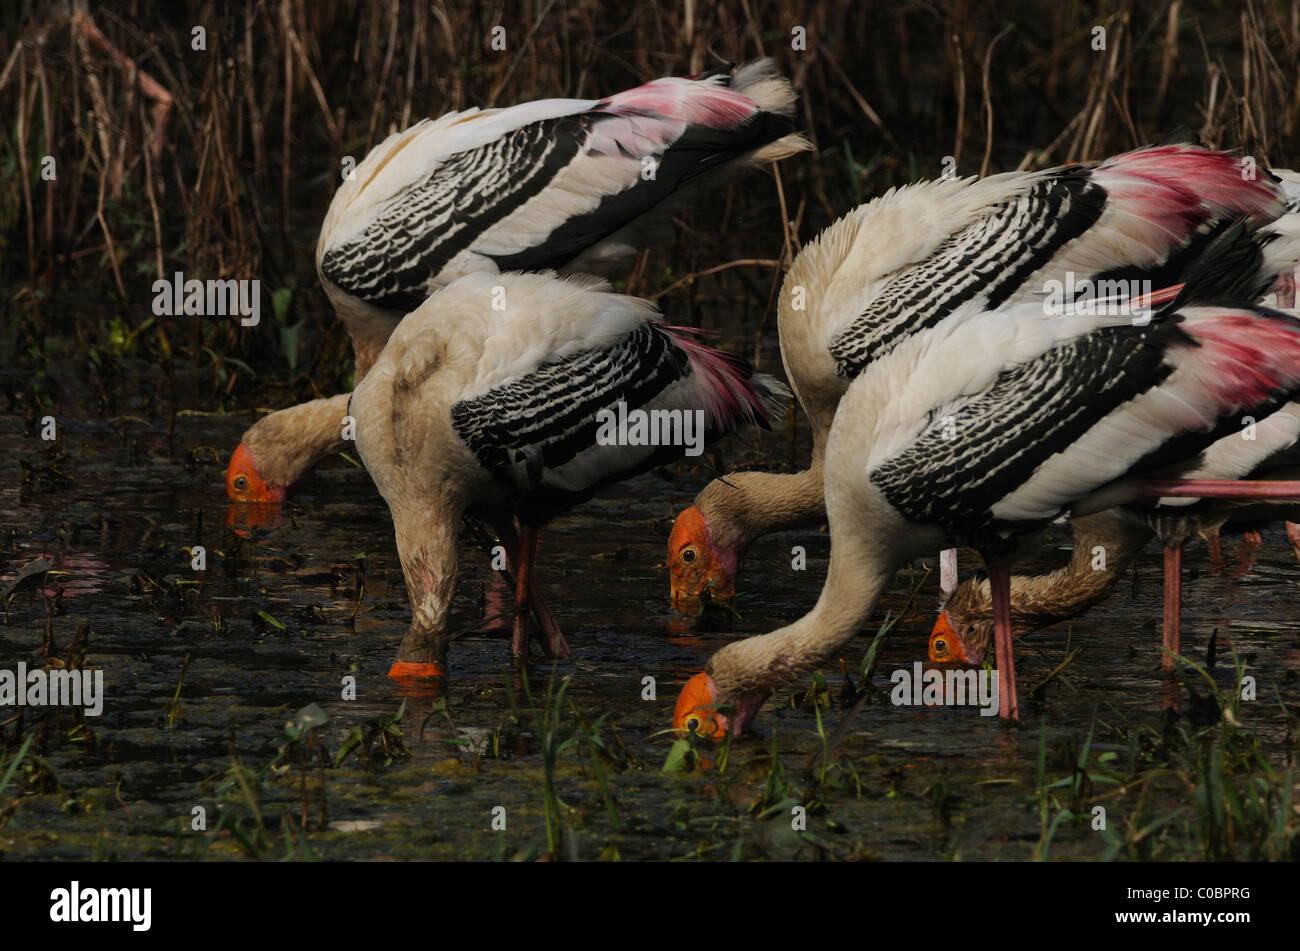 Painted storks feeding in Keoladeo Ghana National Park, Bharatpur, India - Stock Image